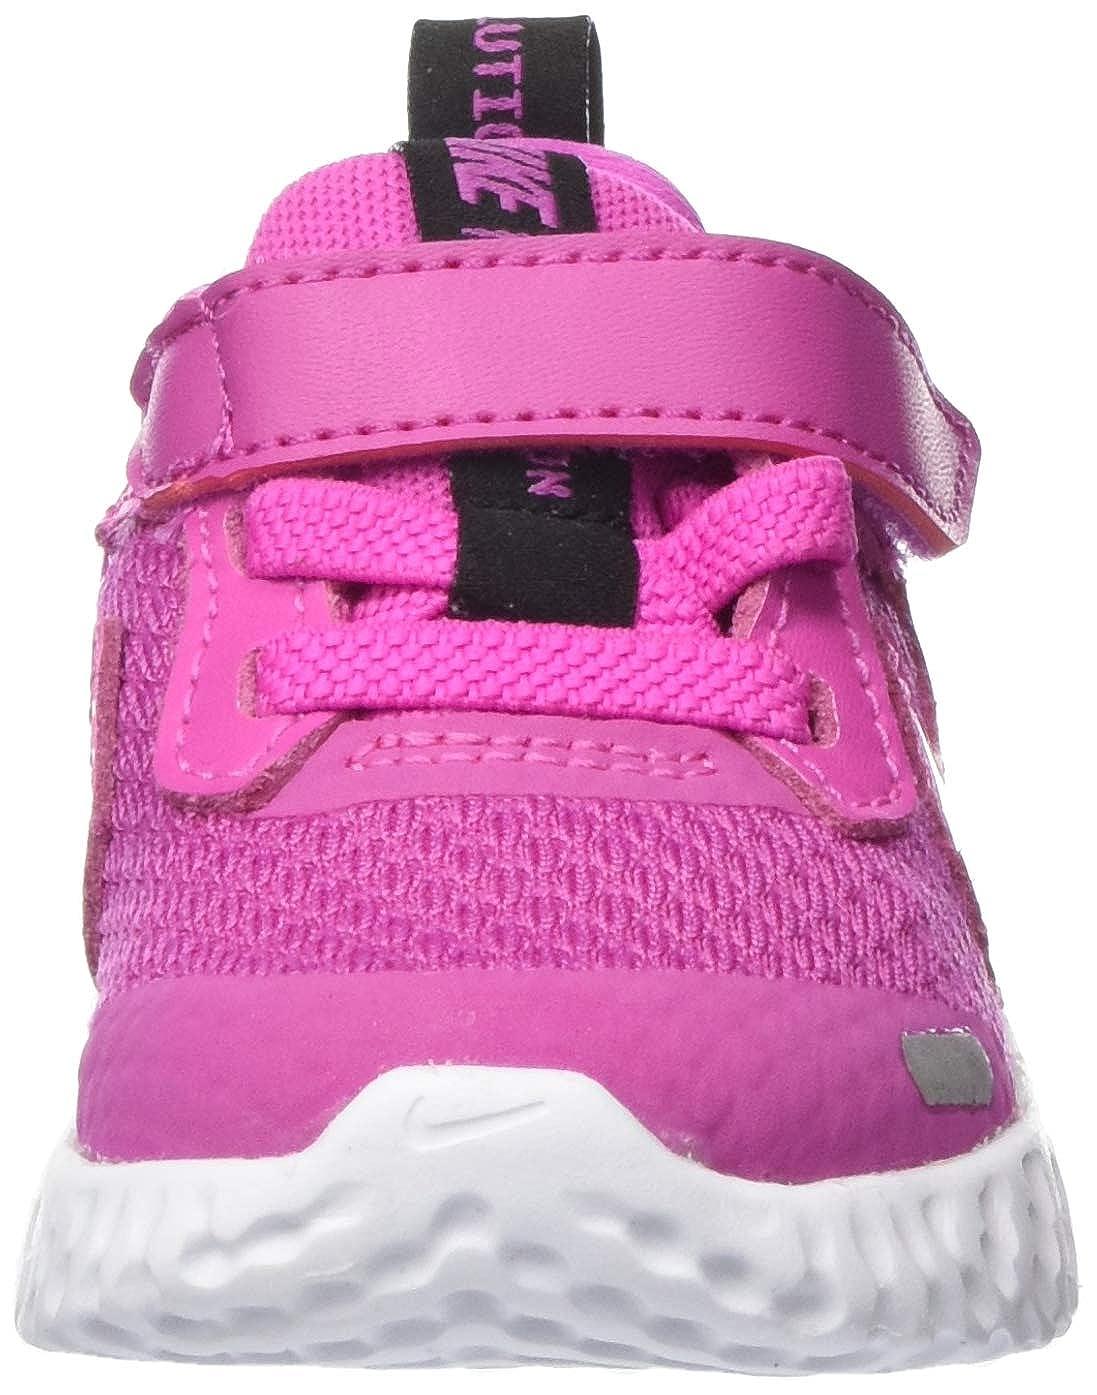 Bambini TDV Nike Revolution 5 Scarpe da Ginnastica Unisex